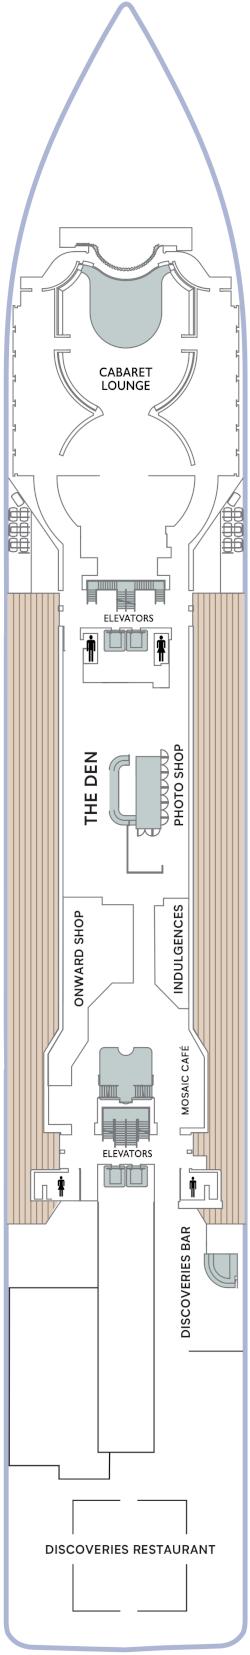 Azamara Onward Deck 5 Deck Plan